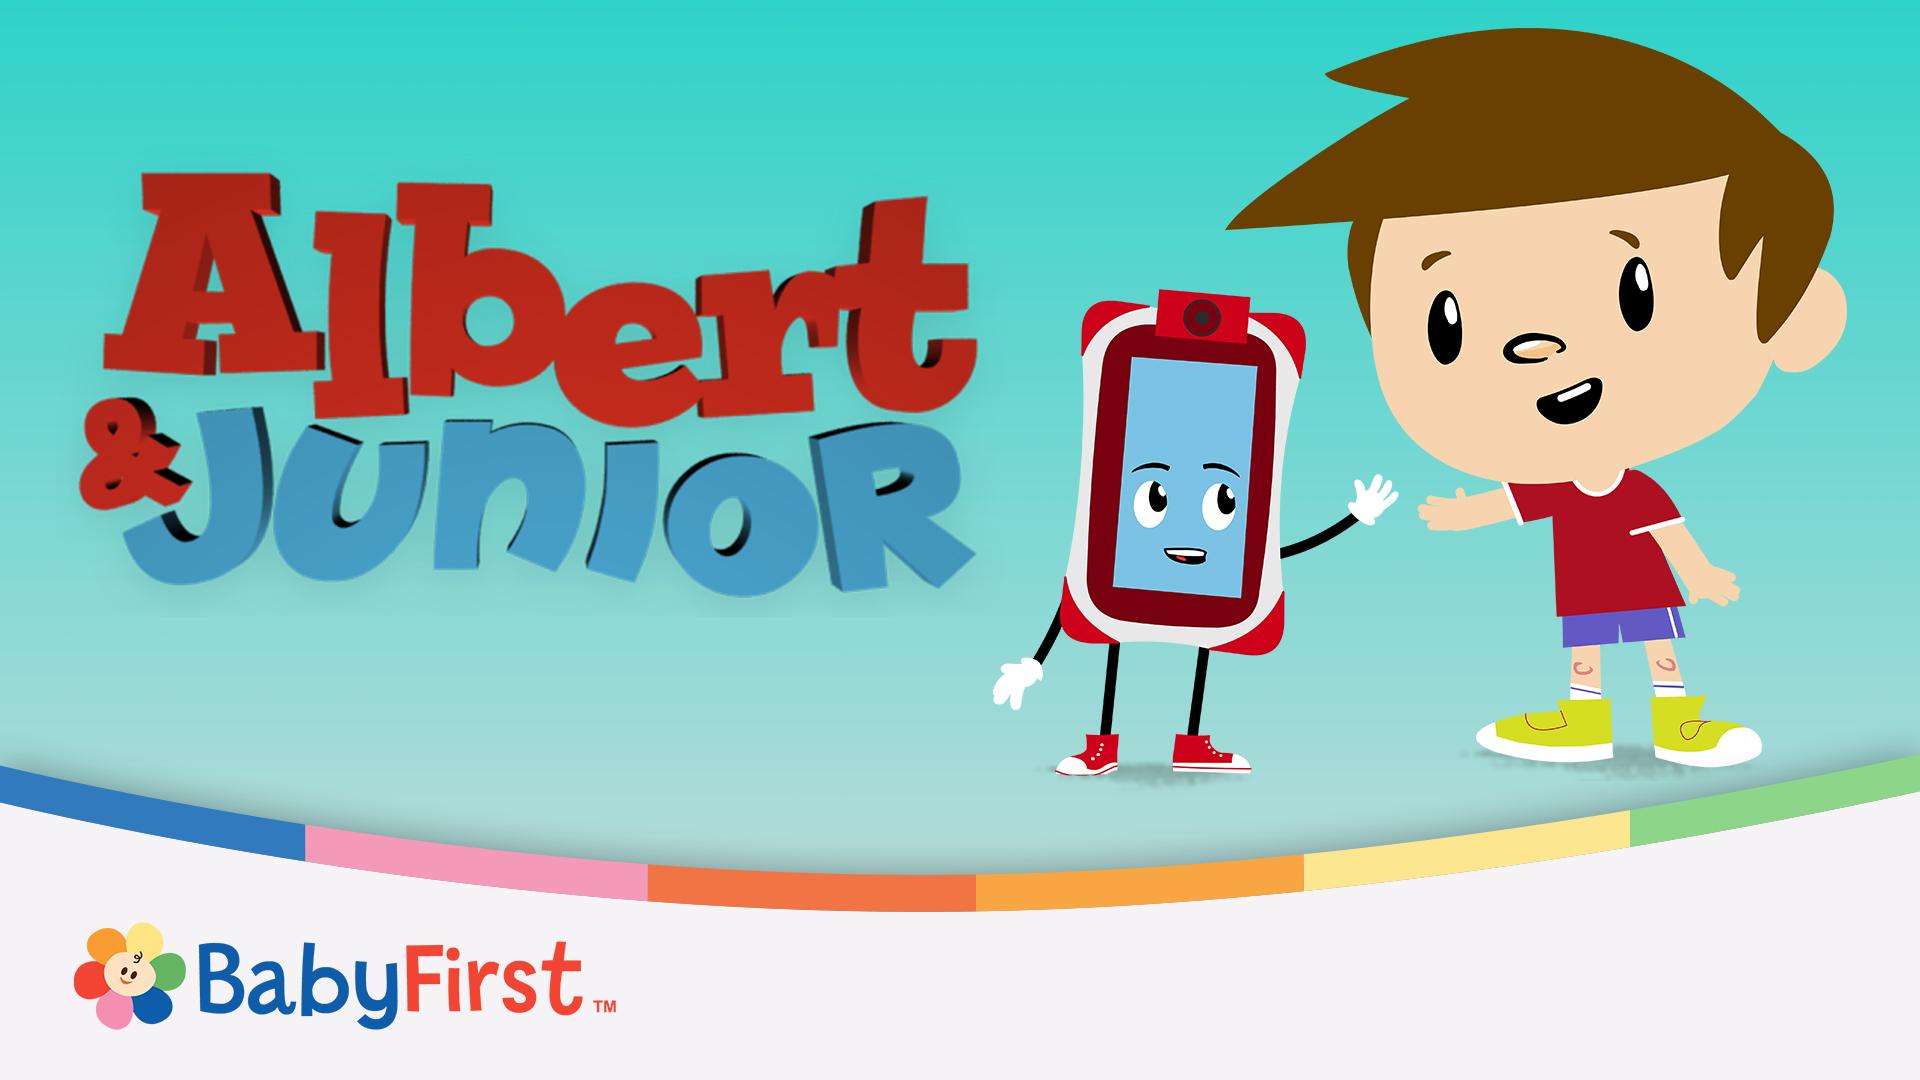 Albert & Junior: Journey of discovery for babies